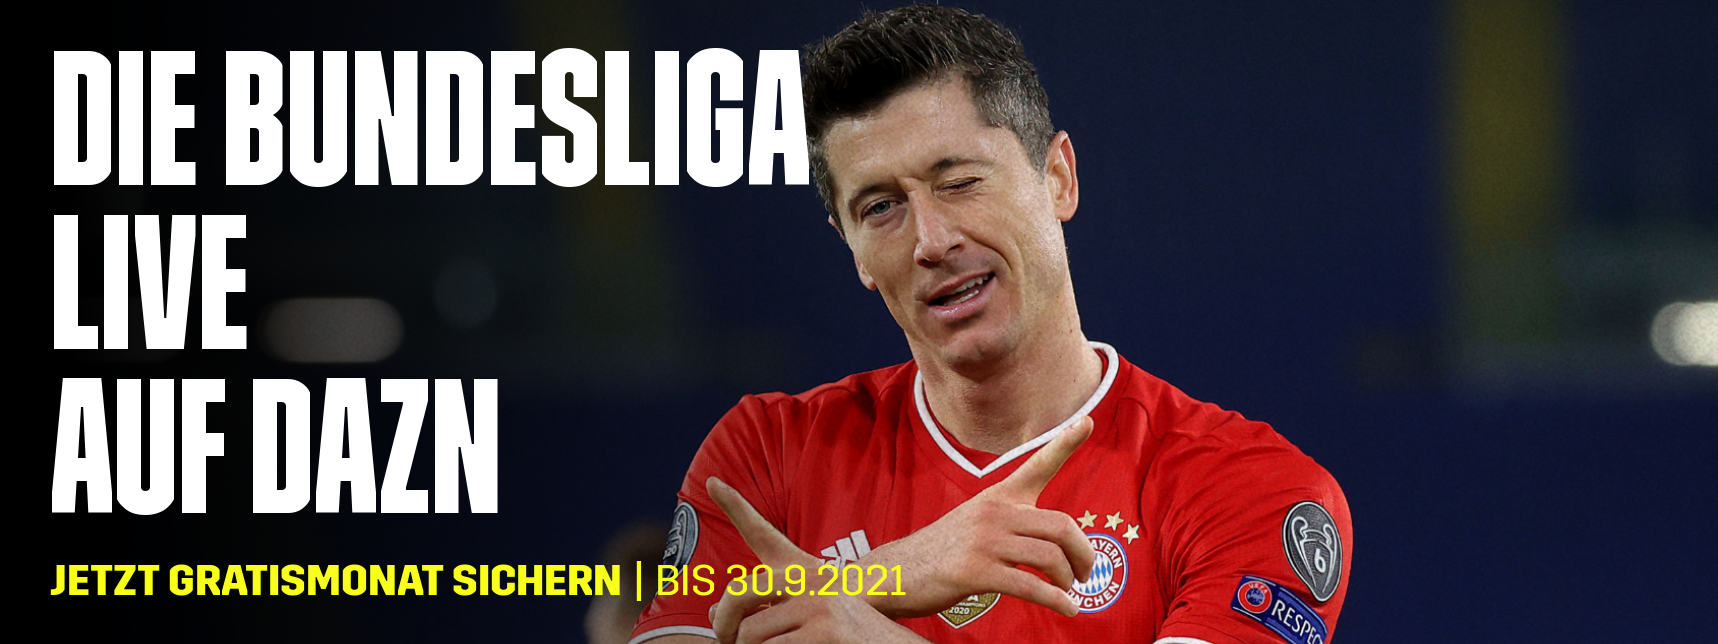 DAZN Banner Bundesliga mit Gratismonat